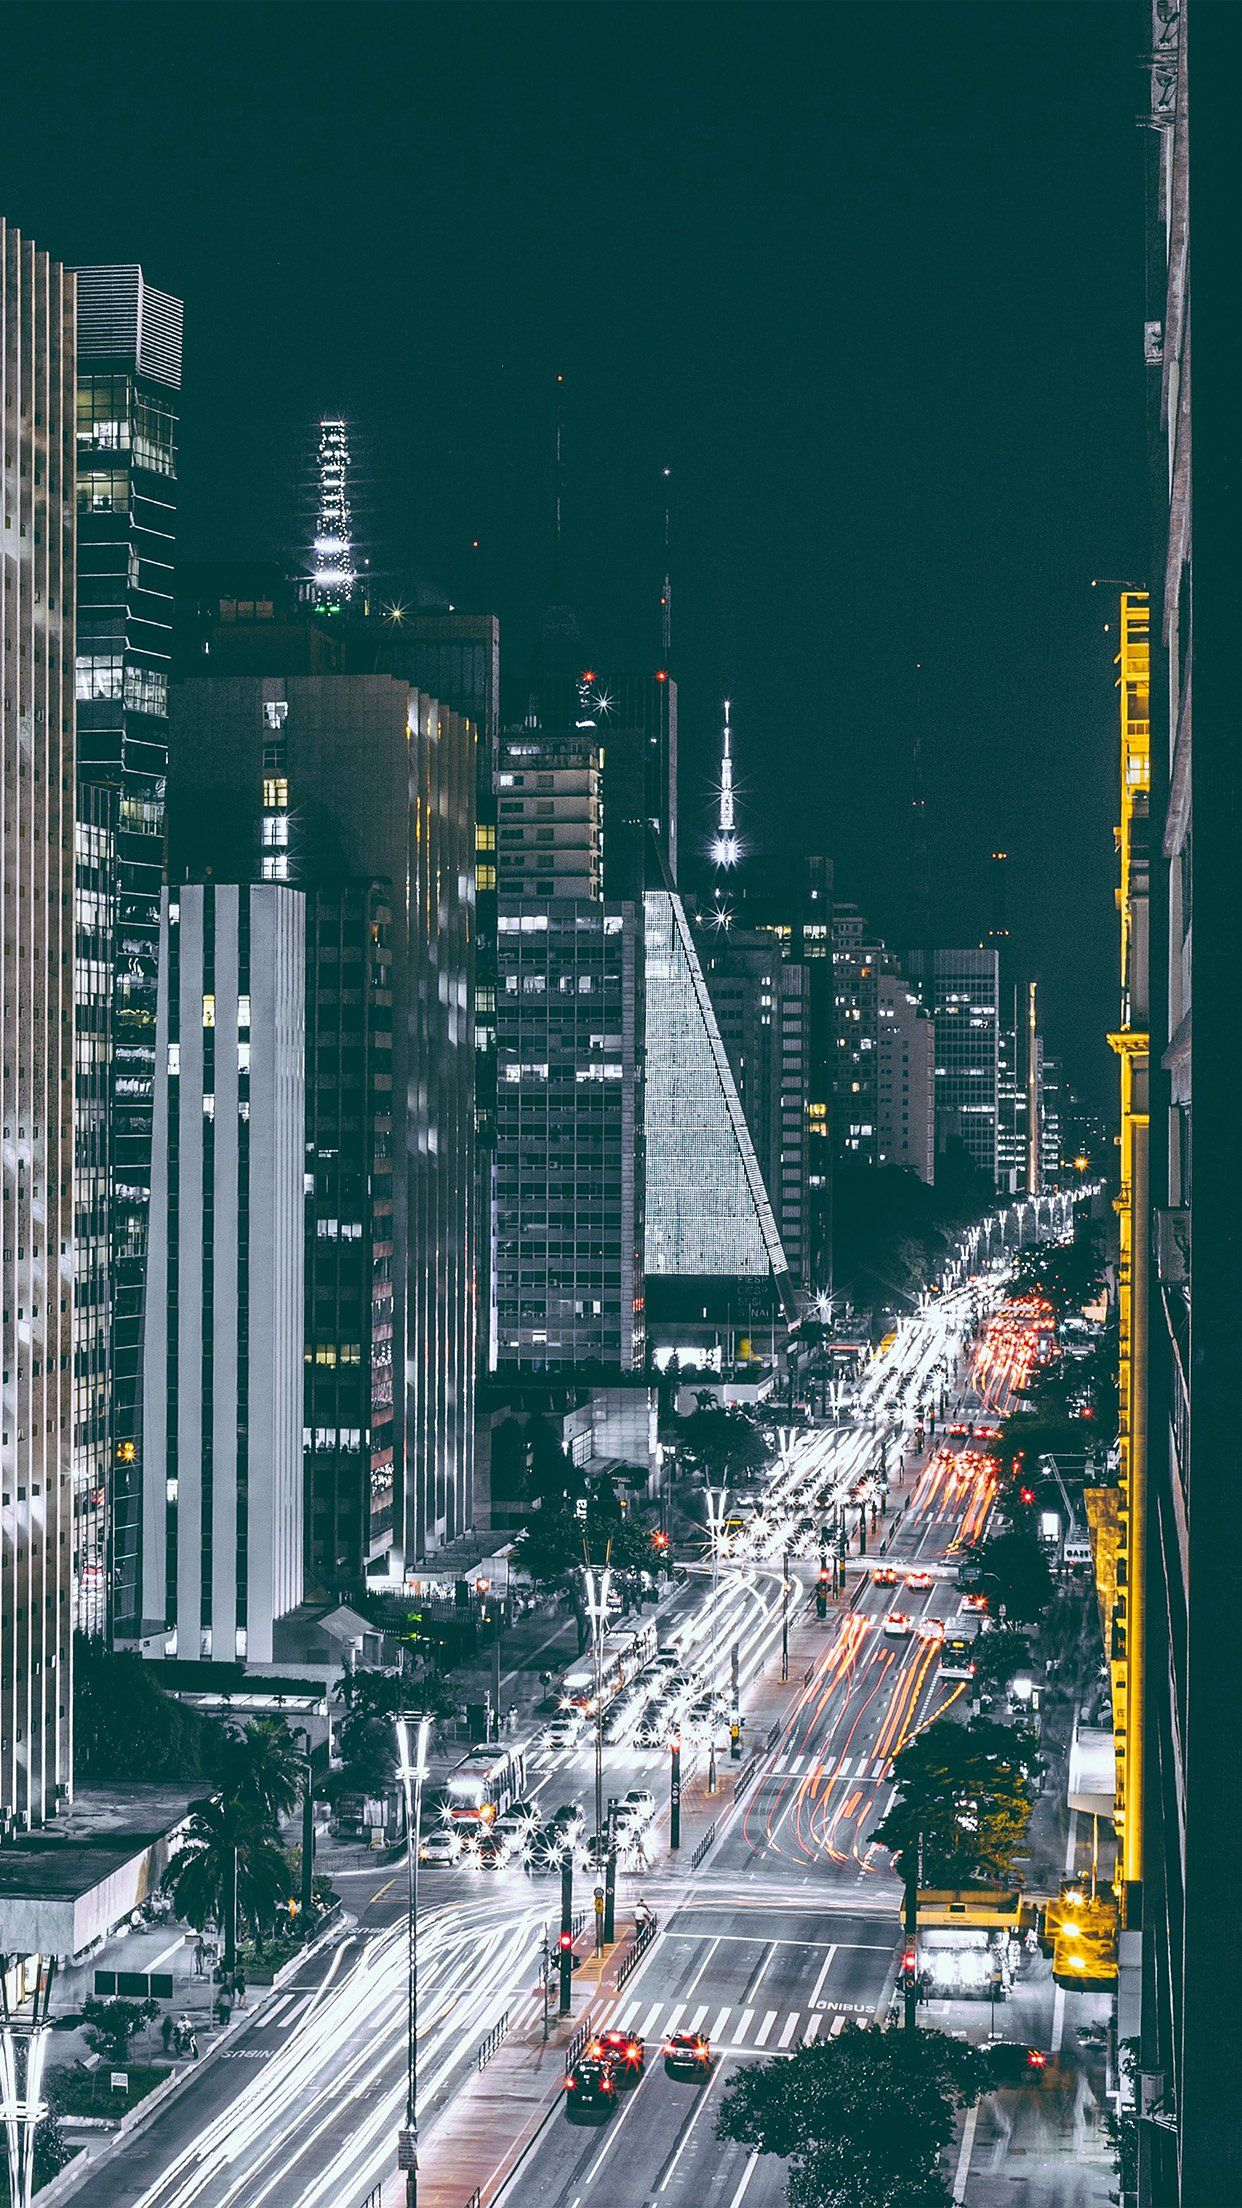 cool city-night-view-urban-street iphone6-plus-wallpaper   Mobile Wallpaper   Iphone 6 wallpaper ...